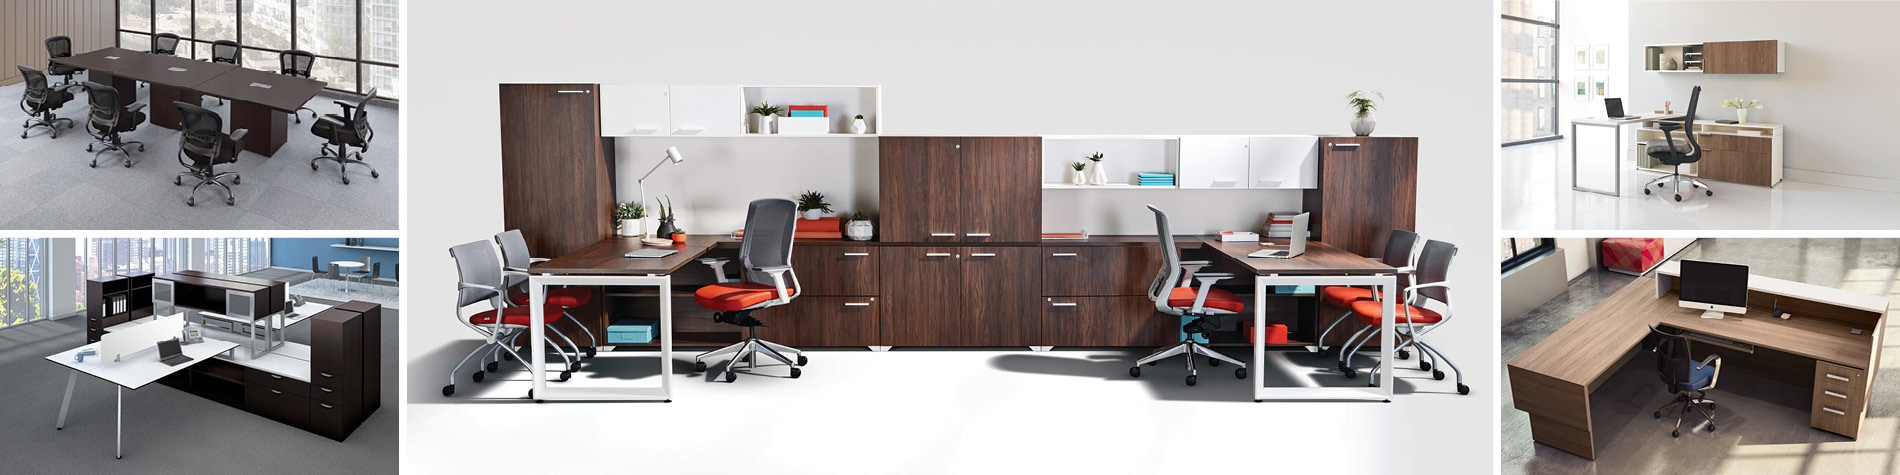 Interior Design Source Furniture ~ Source specials office furniture